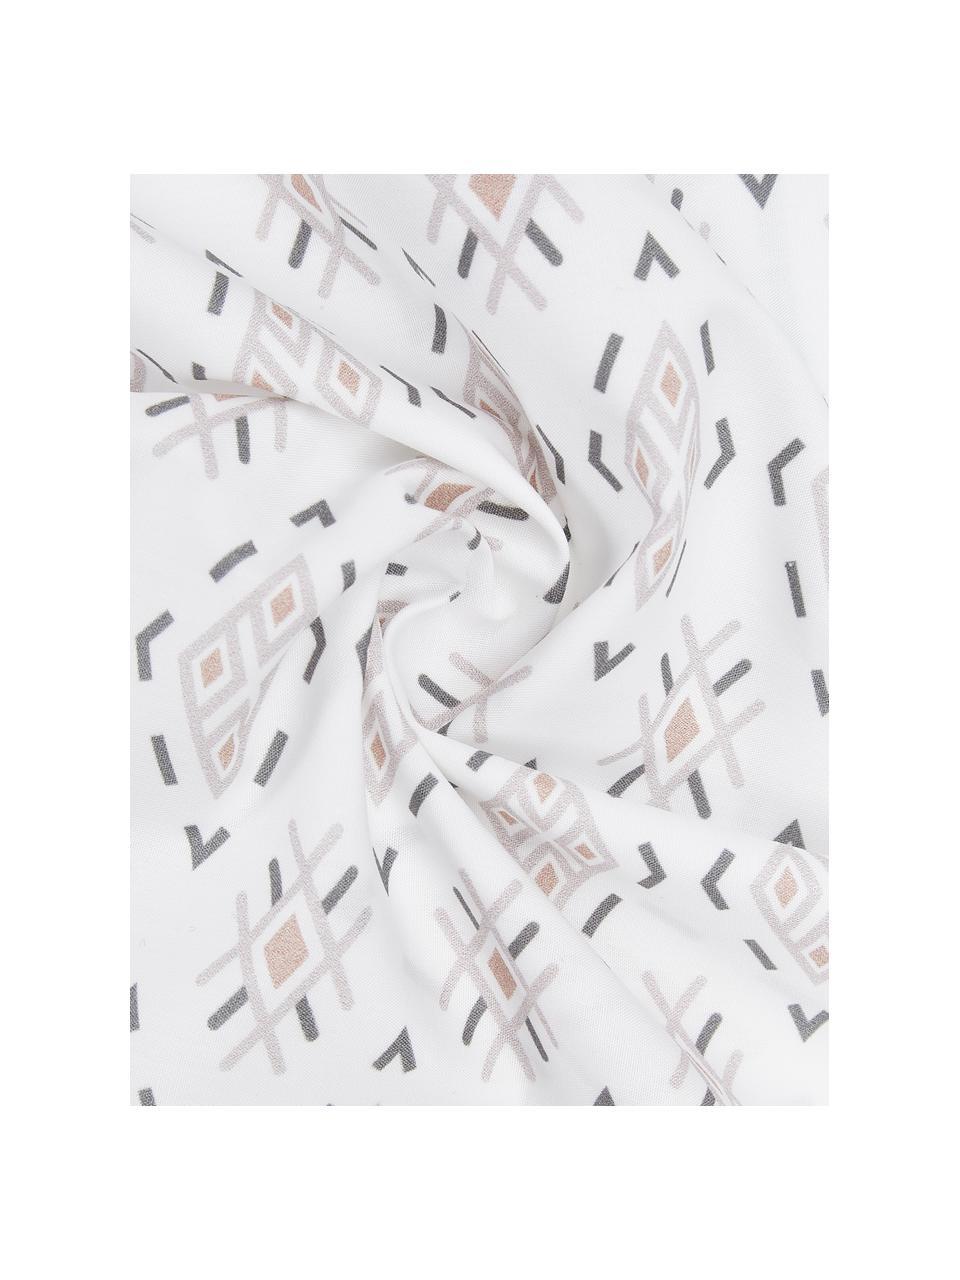 Baumwoll-Wendebettwäsche Lawana im Boho Style, Webart: Perkal Fadendichte 180 TC, Weiß,Mehrfarbig, 135 x 200 cm + 1 Kissen 80 x 80 cm